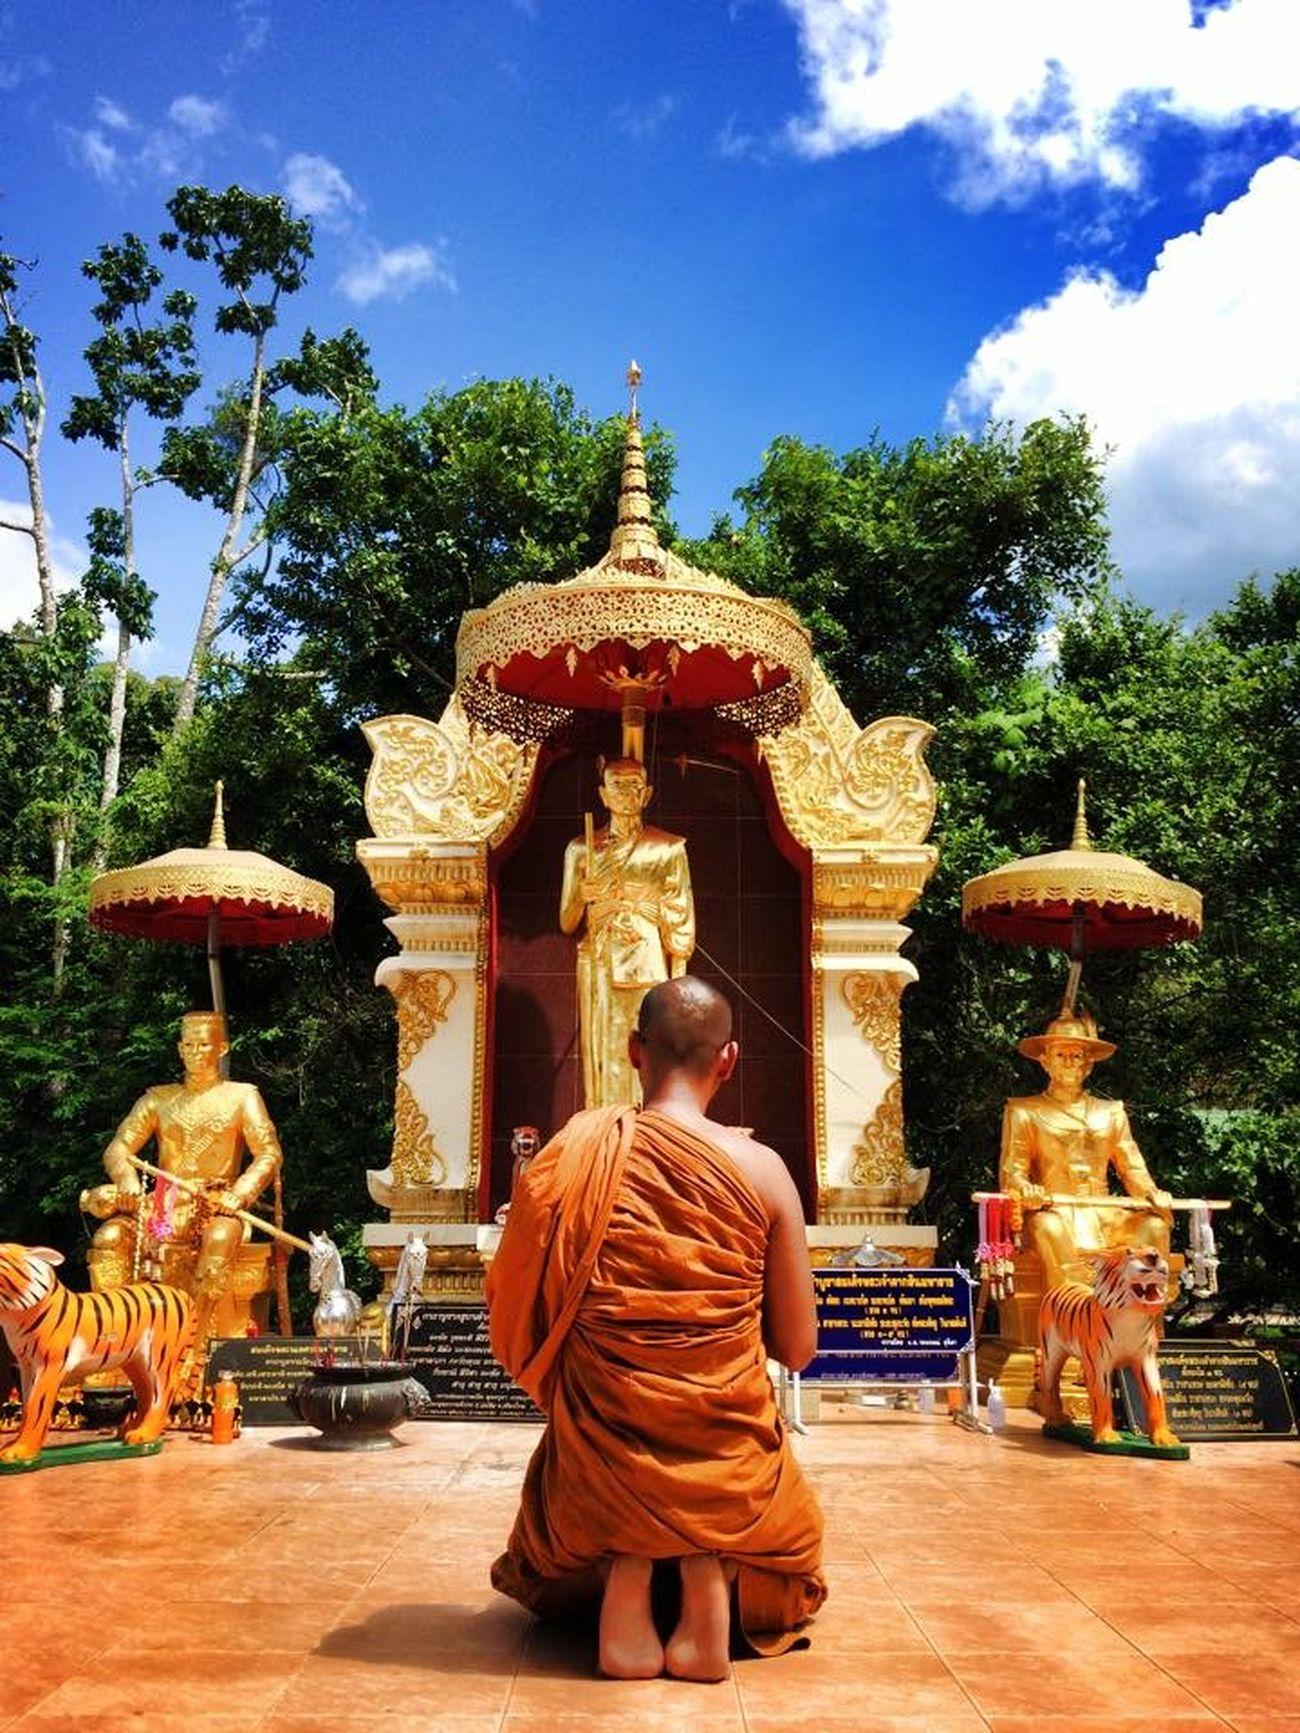 The power of faith. Iphonephotography Taking Photos Thailand_allshots IPhoneography Chiang Mai   Thailand Hello World Taking Photos EyeEm Best Shots Temple Thailand